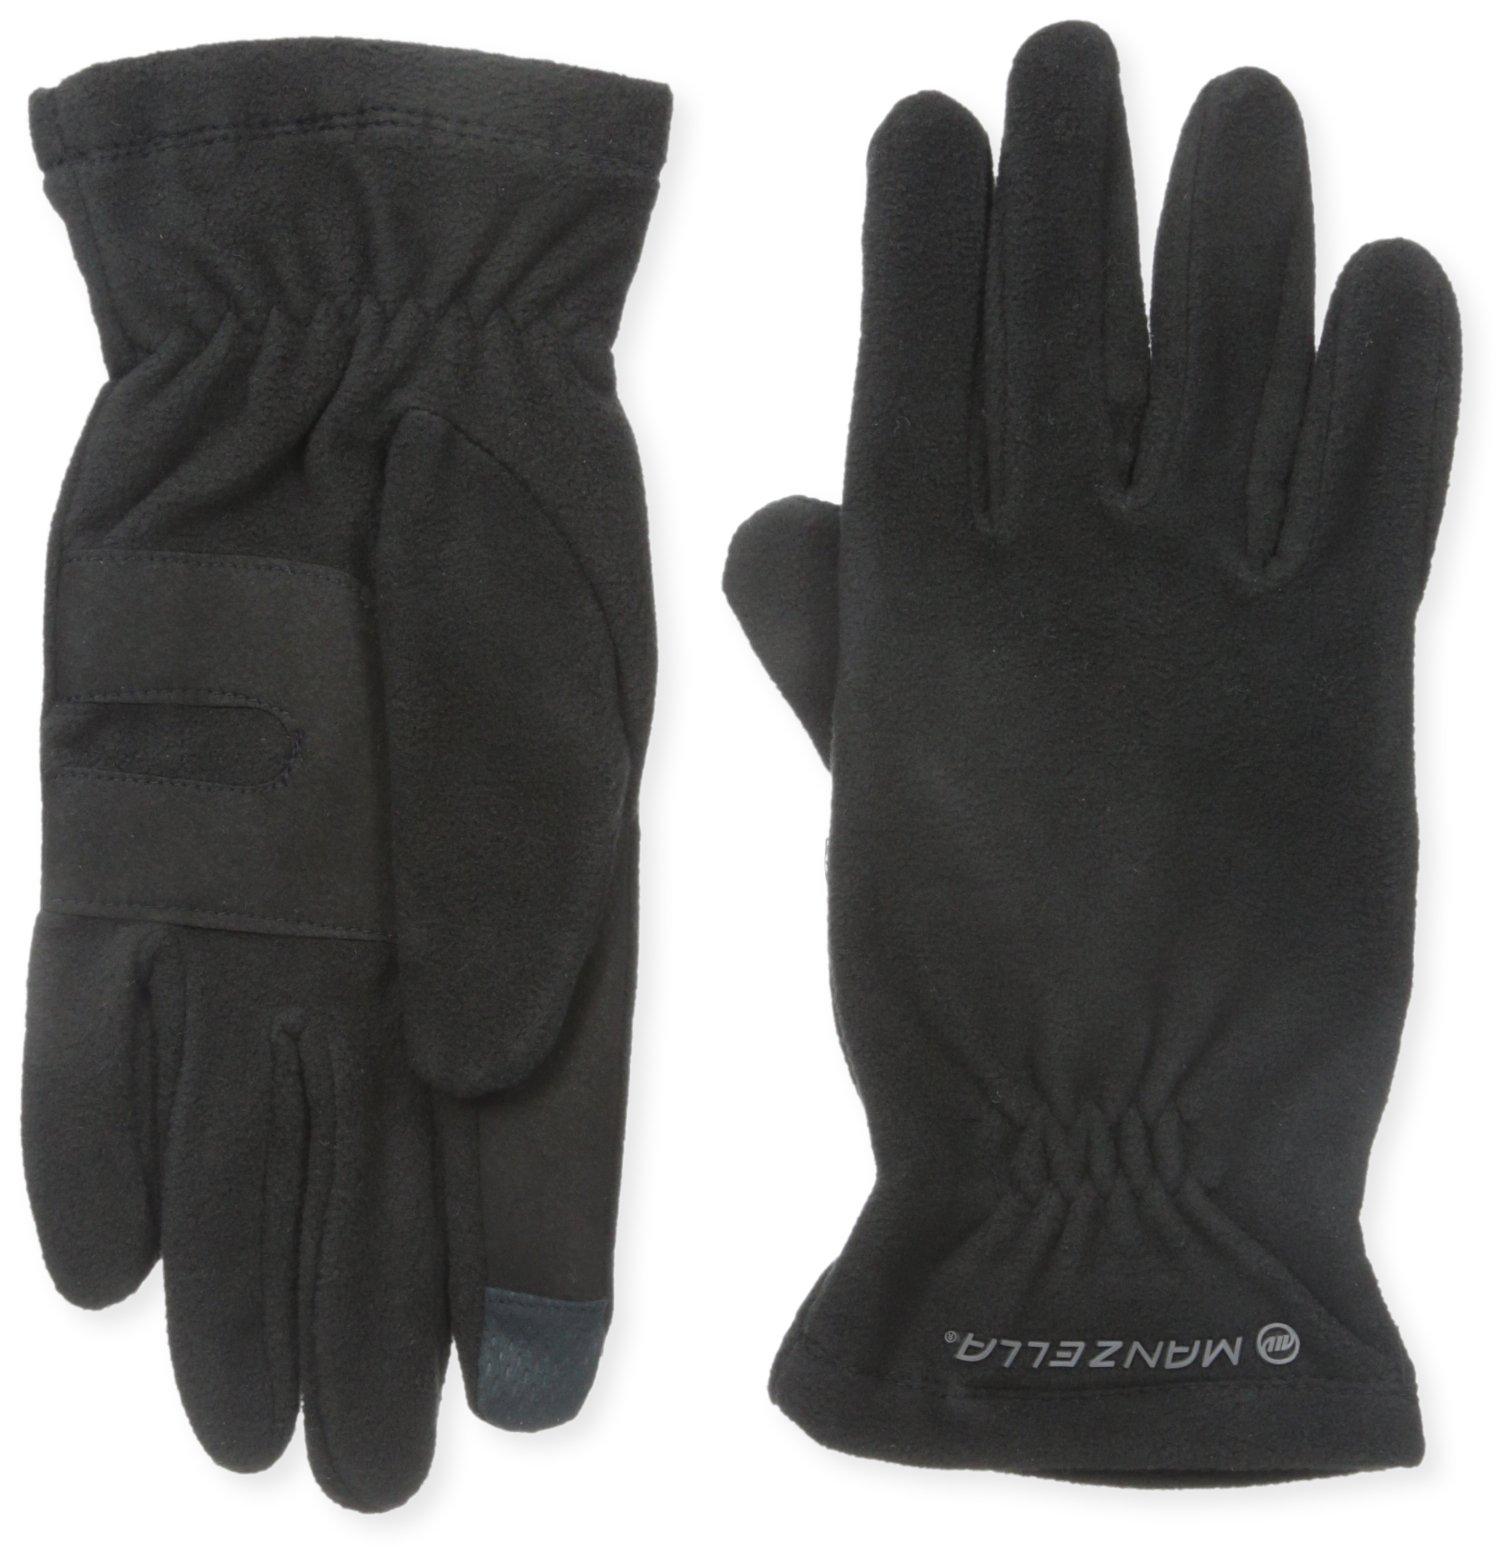 Manzella Men's Tahoe Ultra Touch Tip Gloves, Black, Large/X-Large